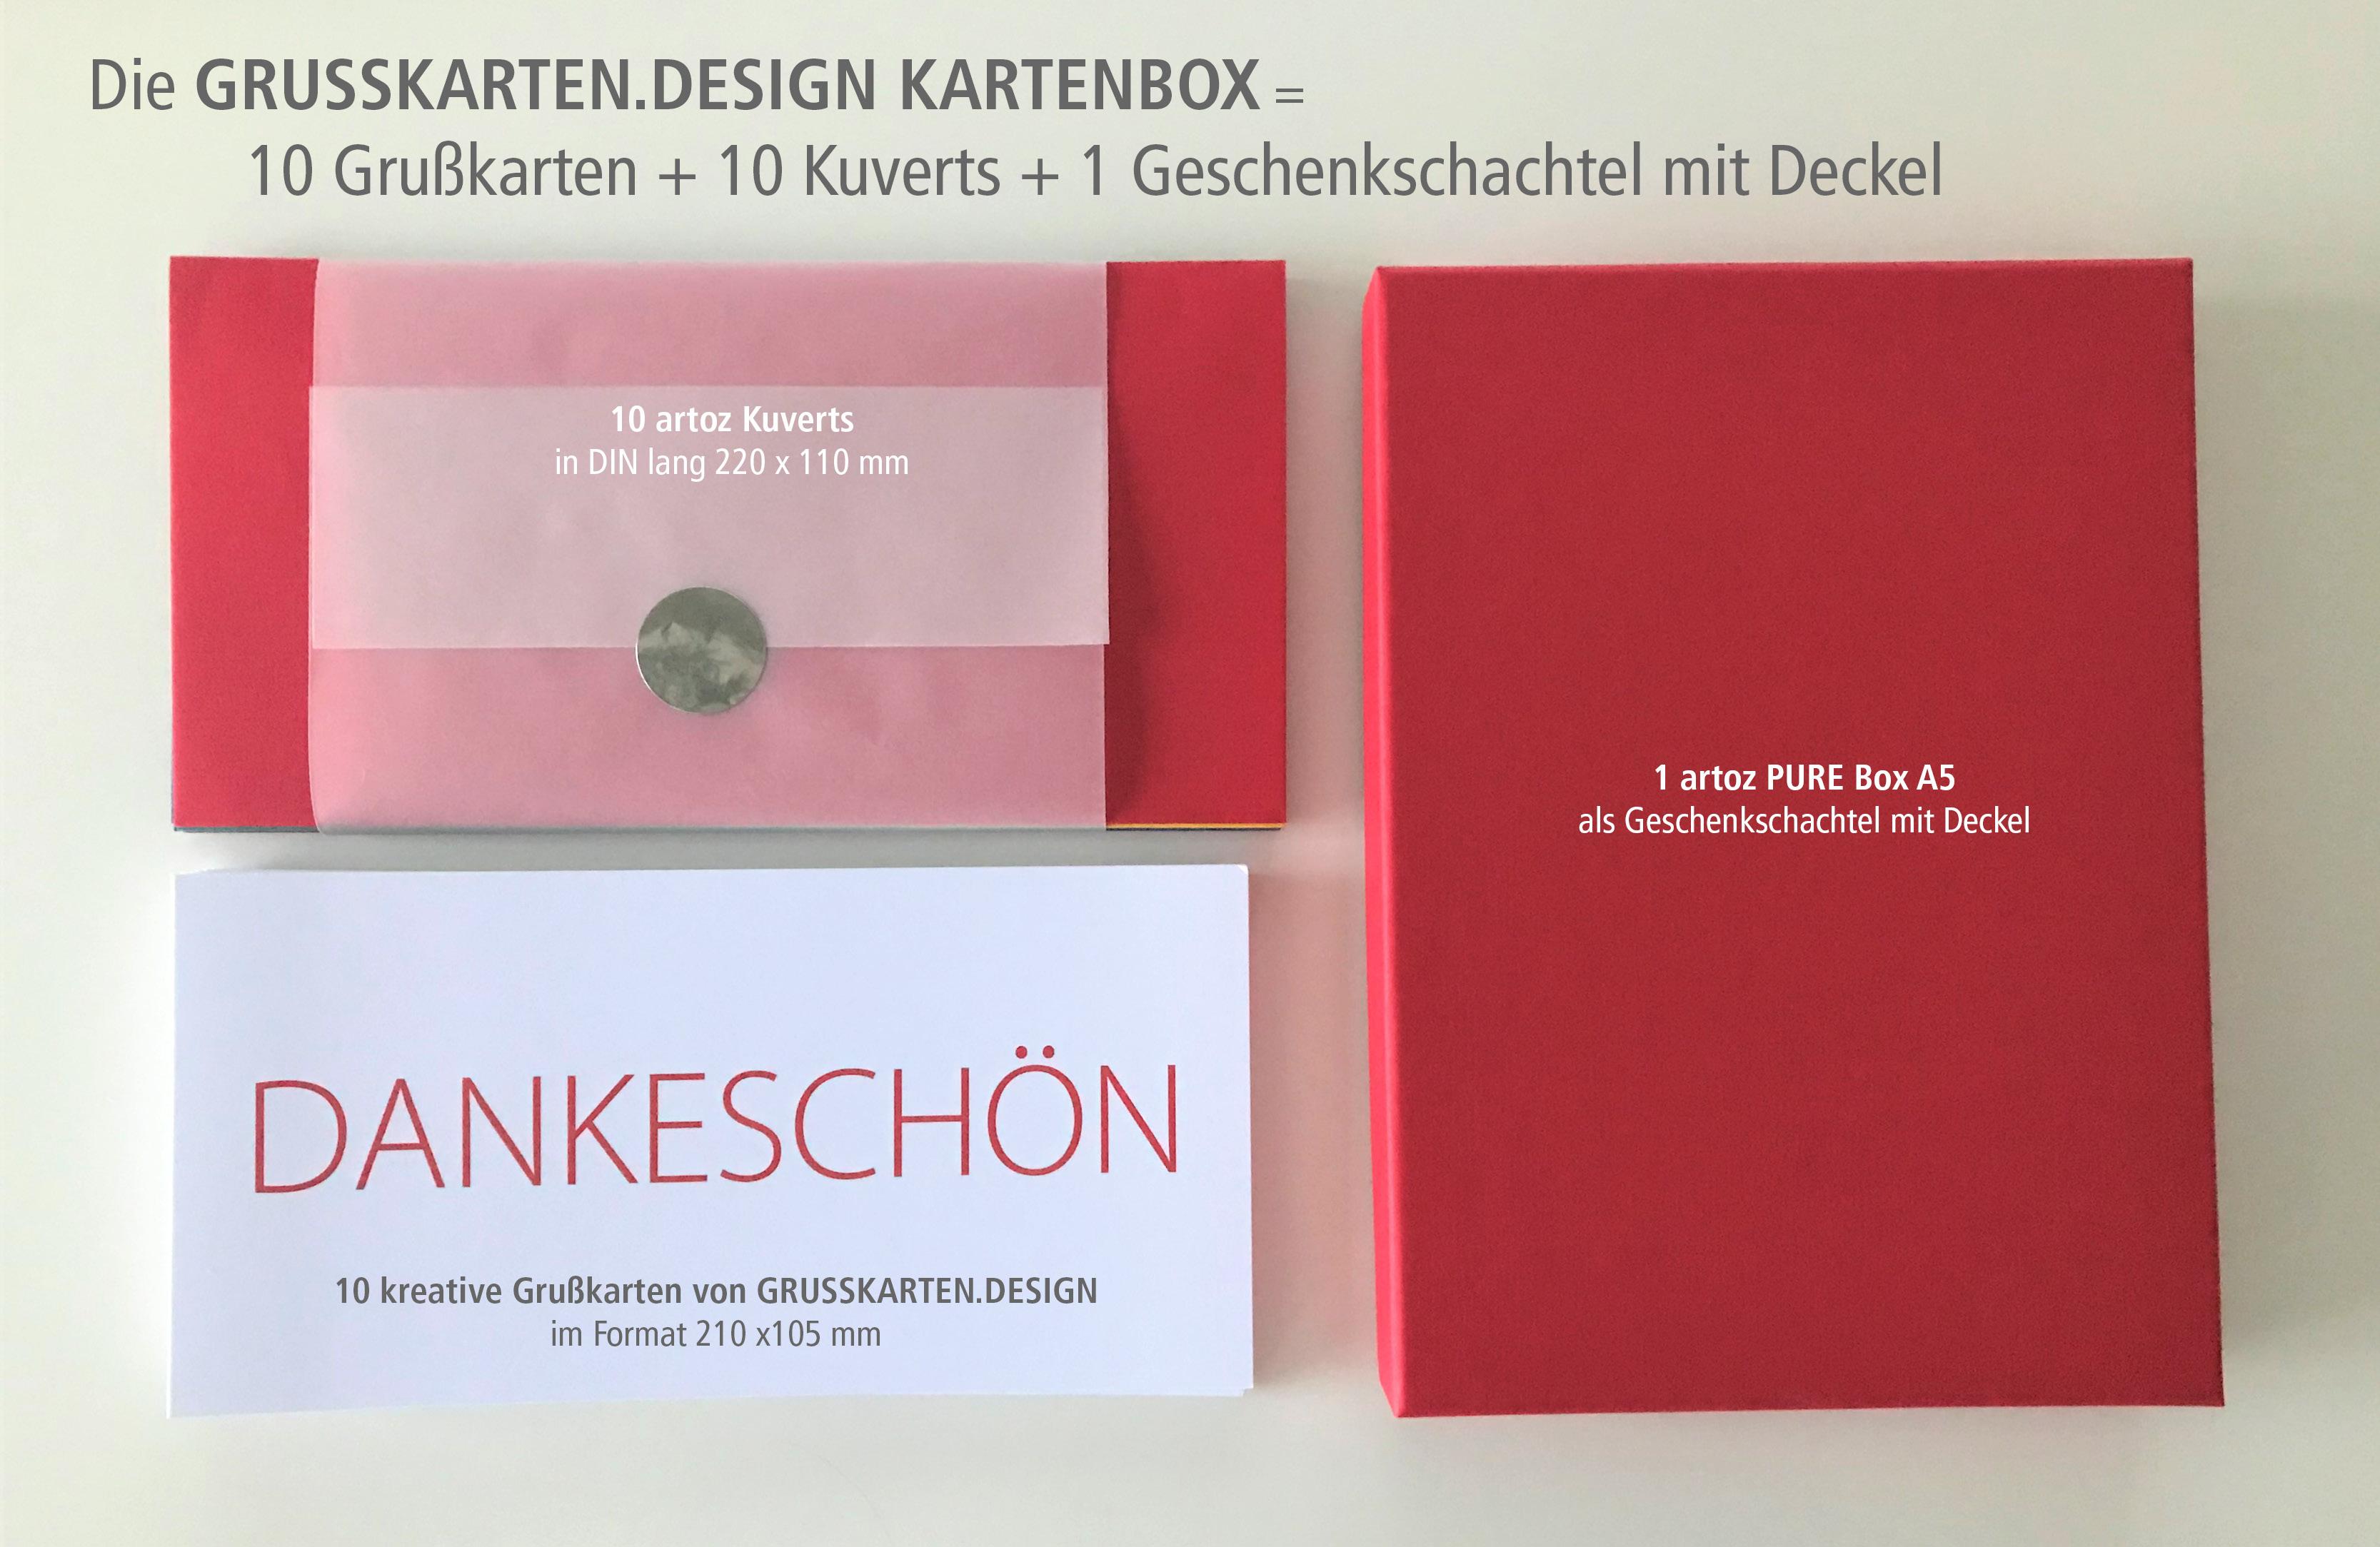 neu_Kartenbox_Erkl-rbild_grusskarten-design-pg